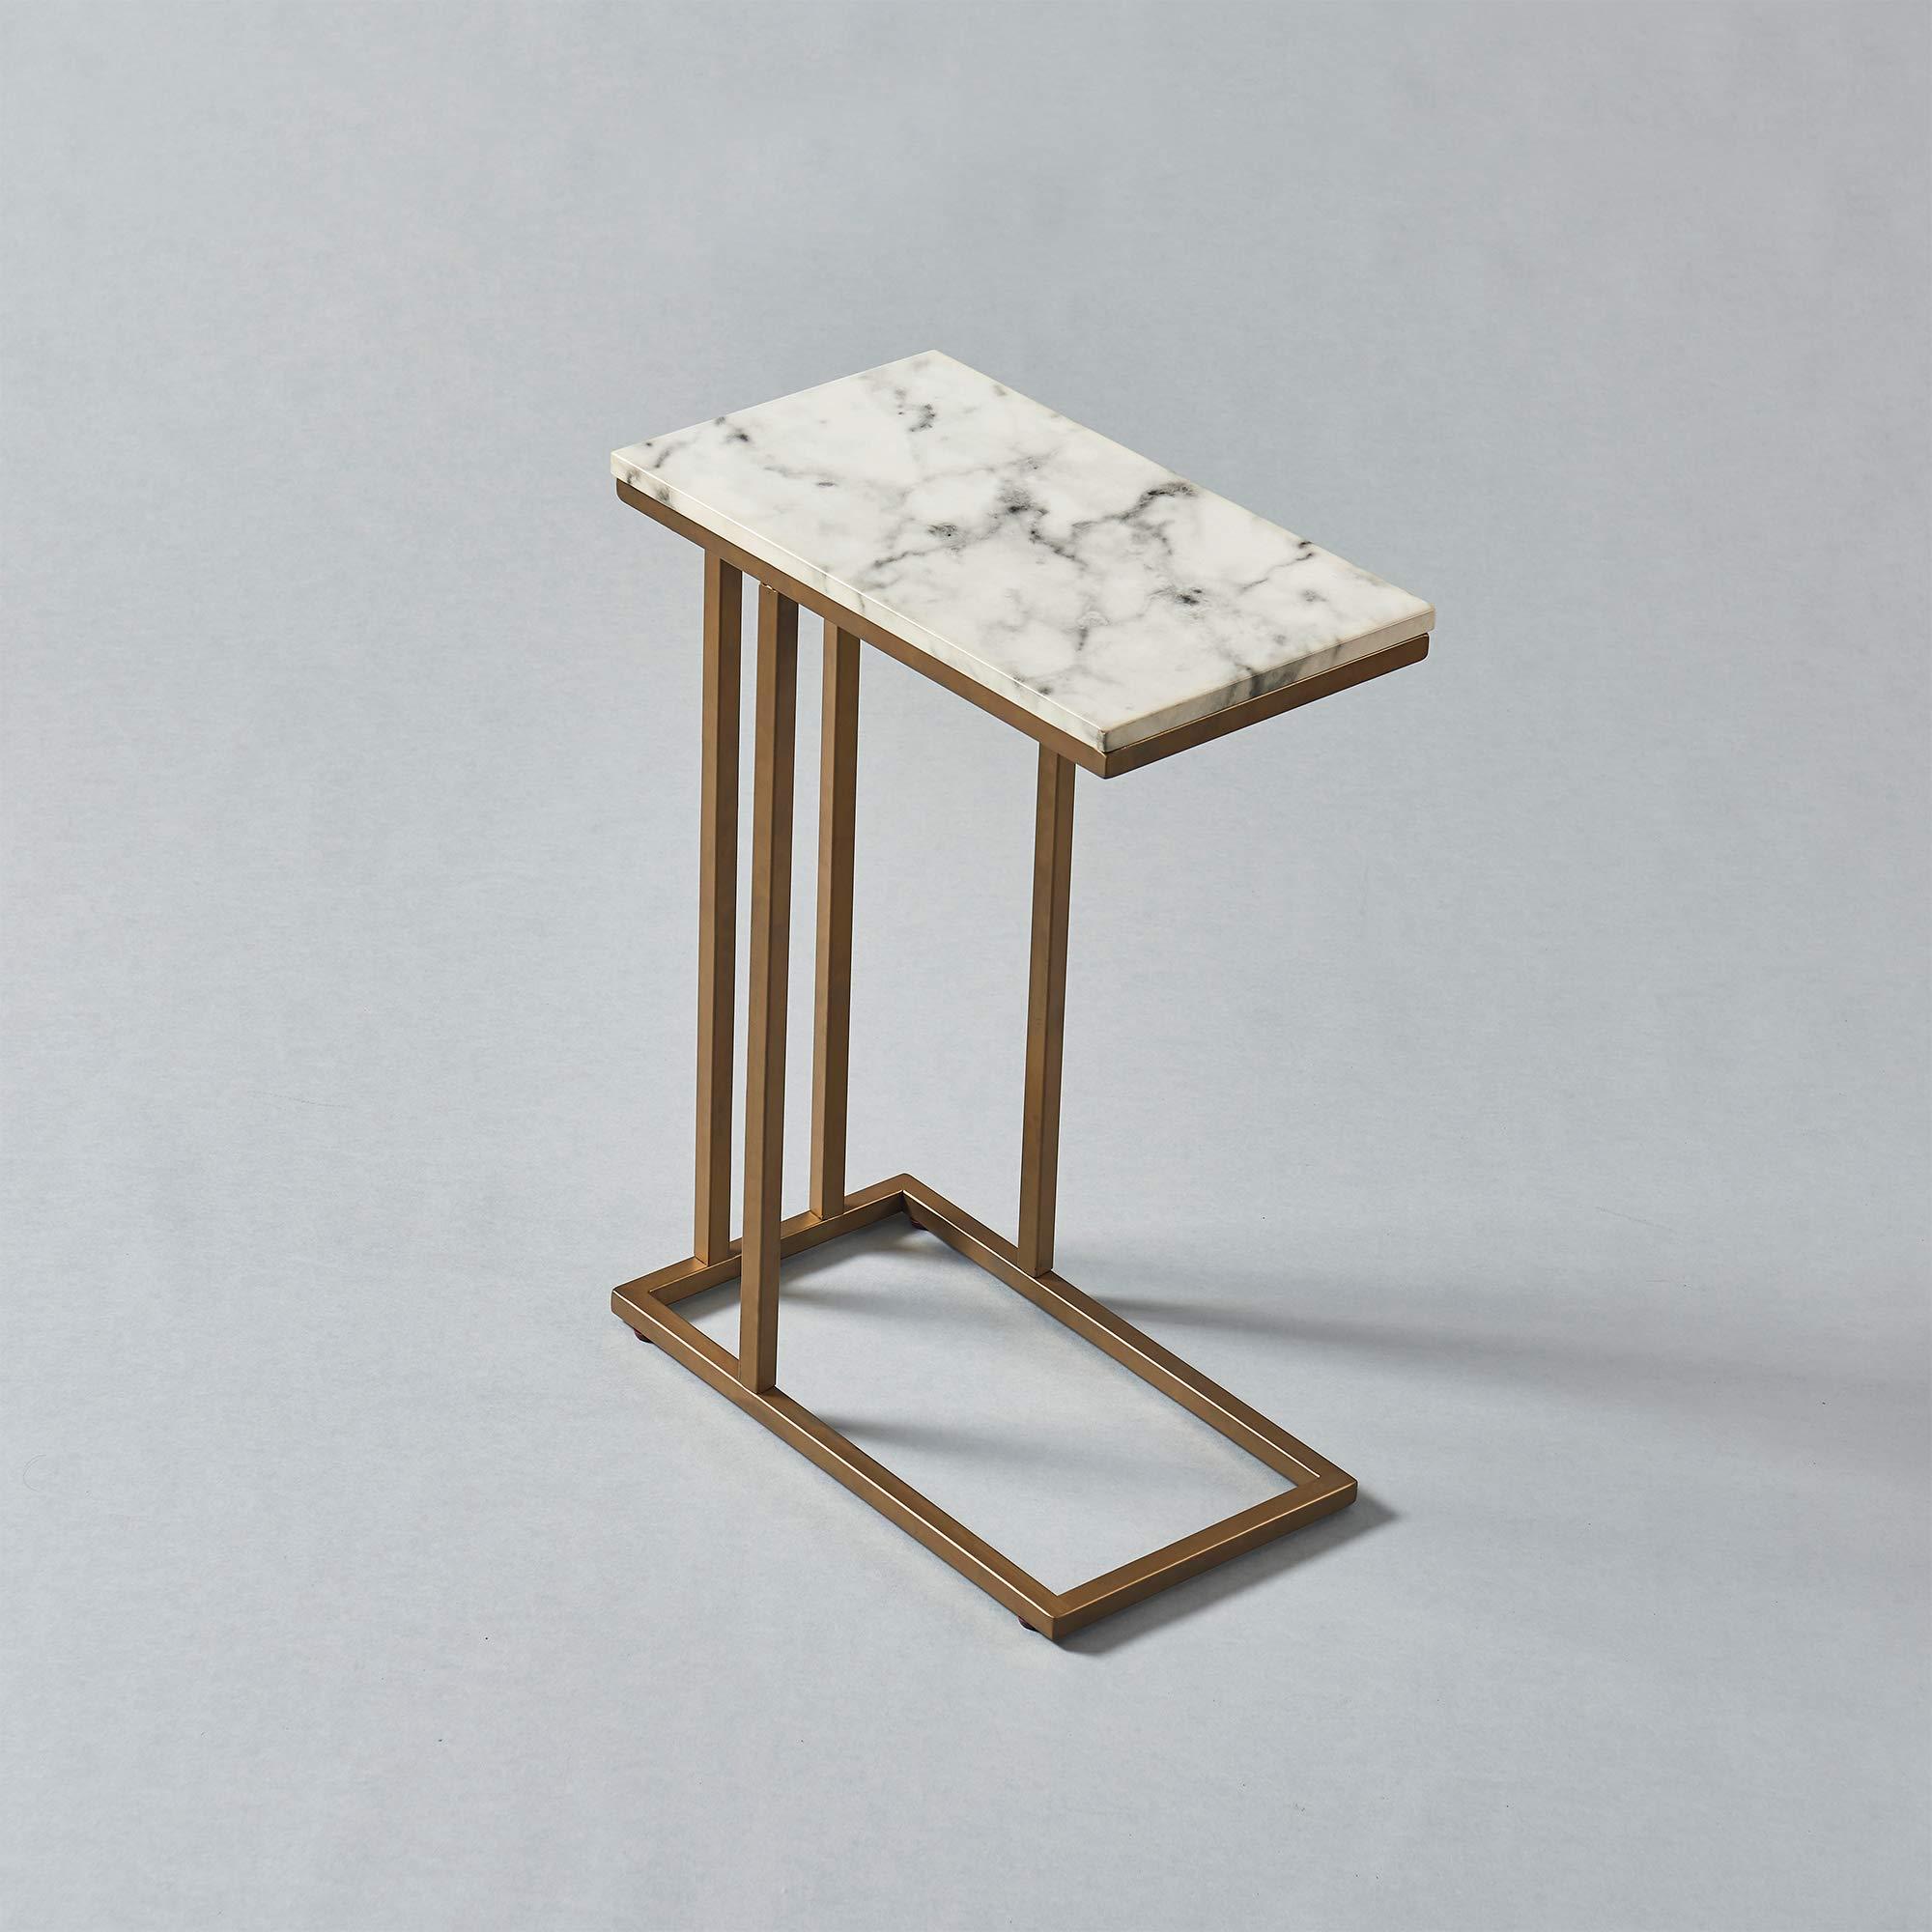 Versanora - Marmo C Shape Table - Faux Marble /Brass by Versanora (Image #14)